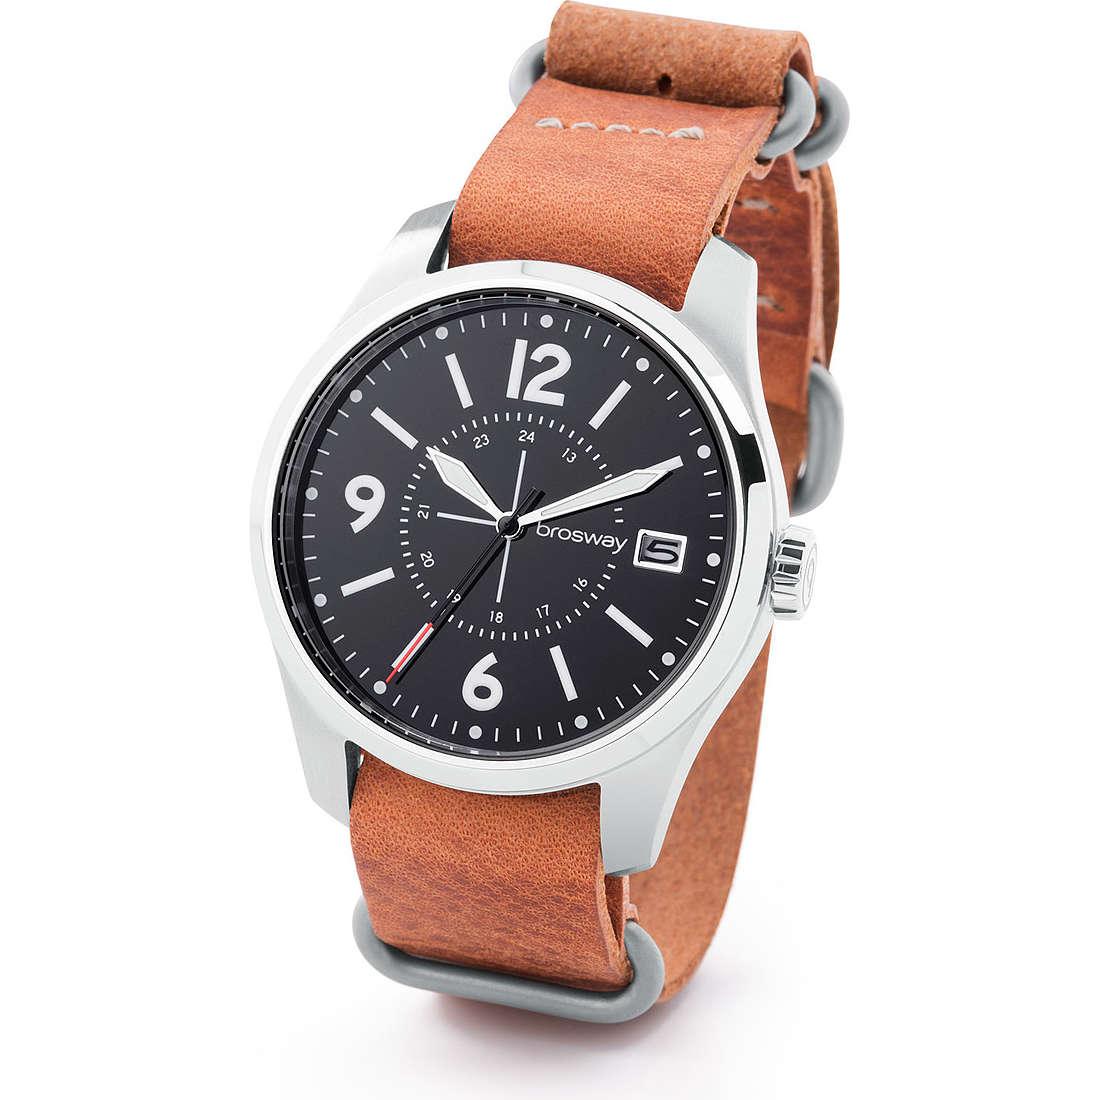 orologio solo tempo uomo Brosway W2 WW206